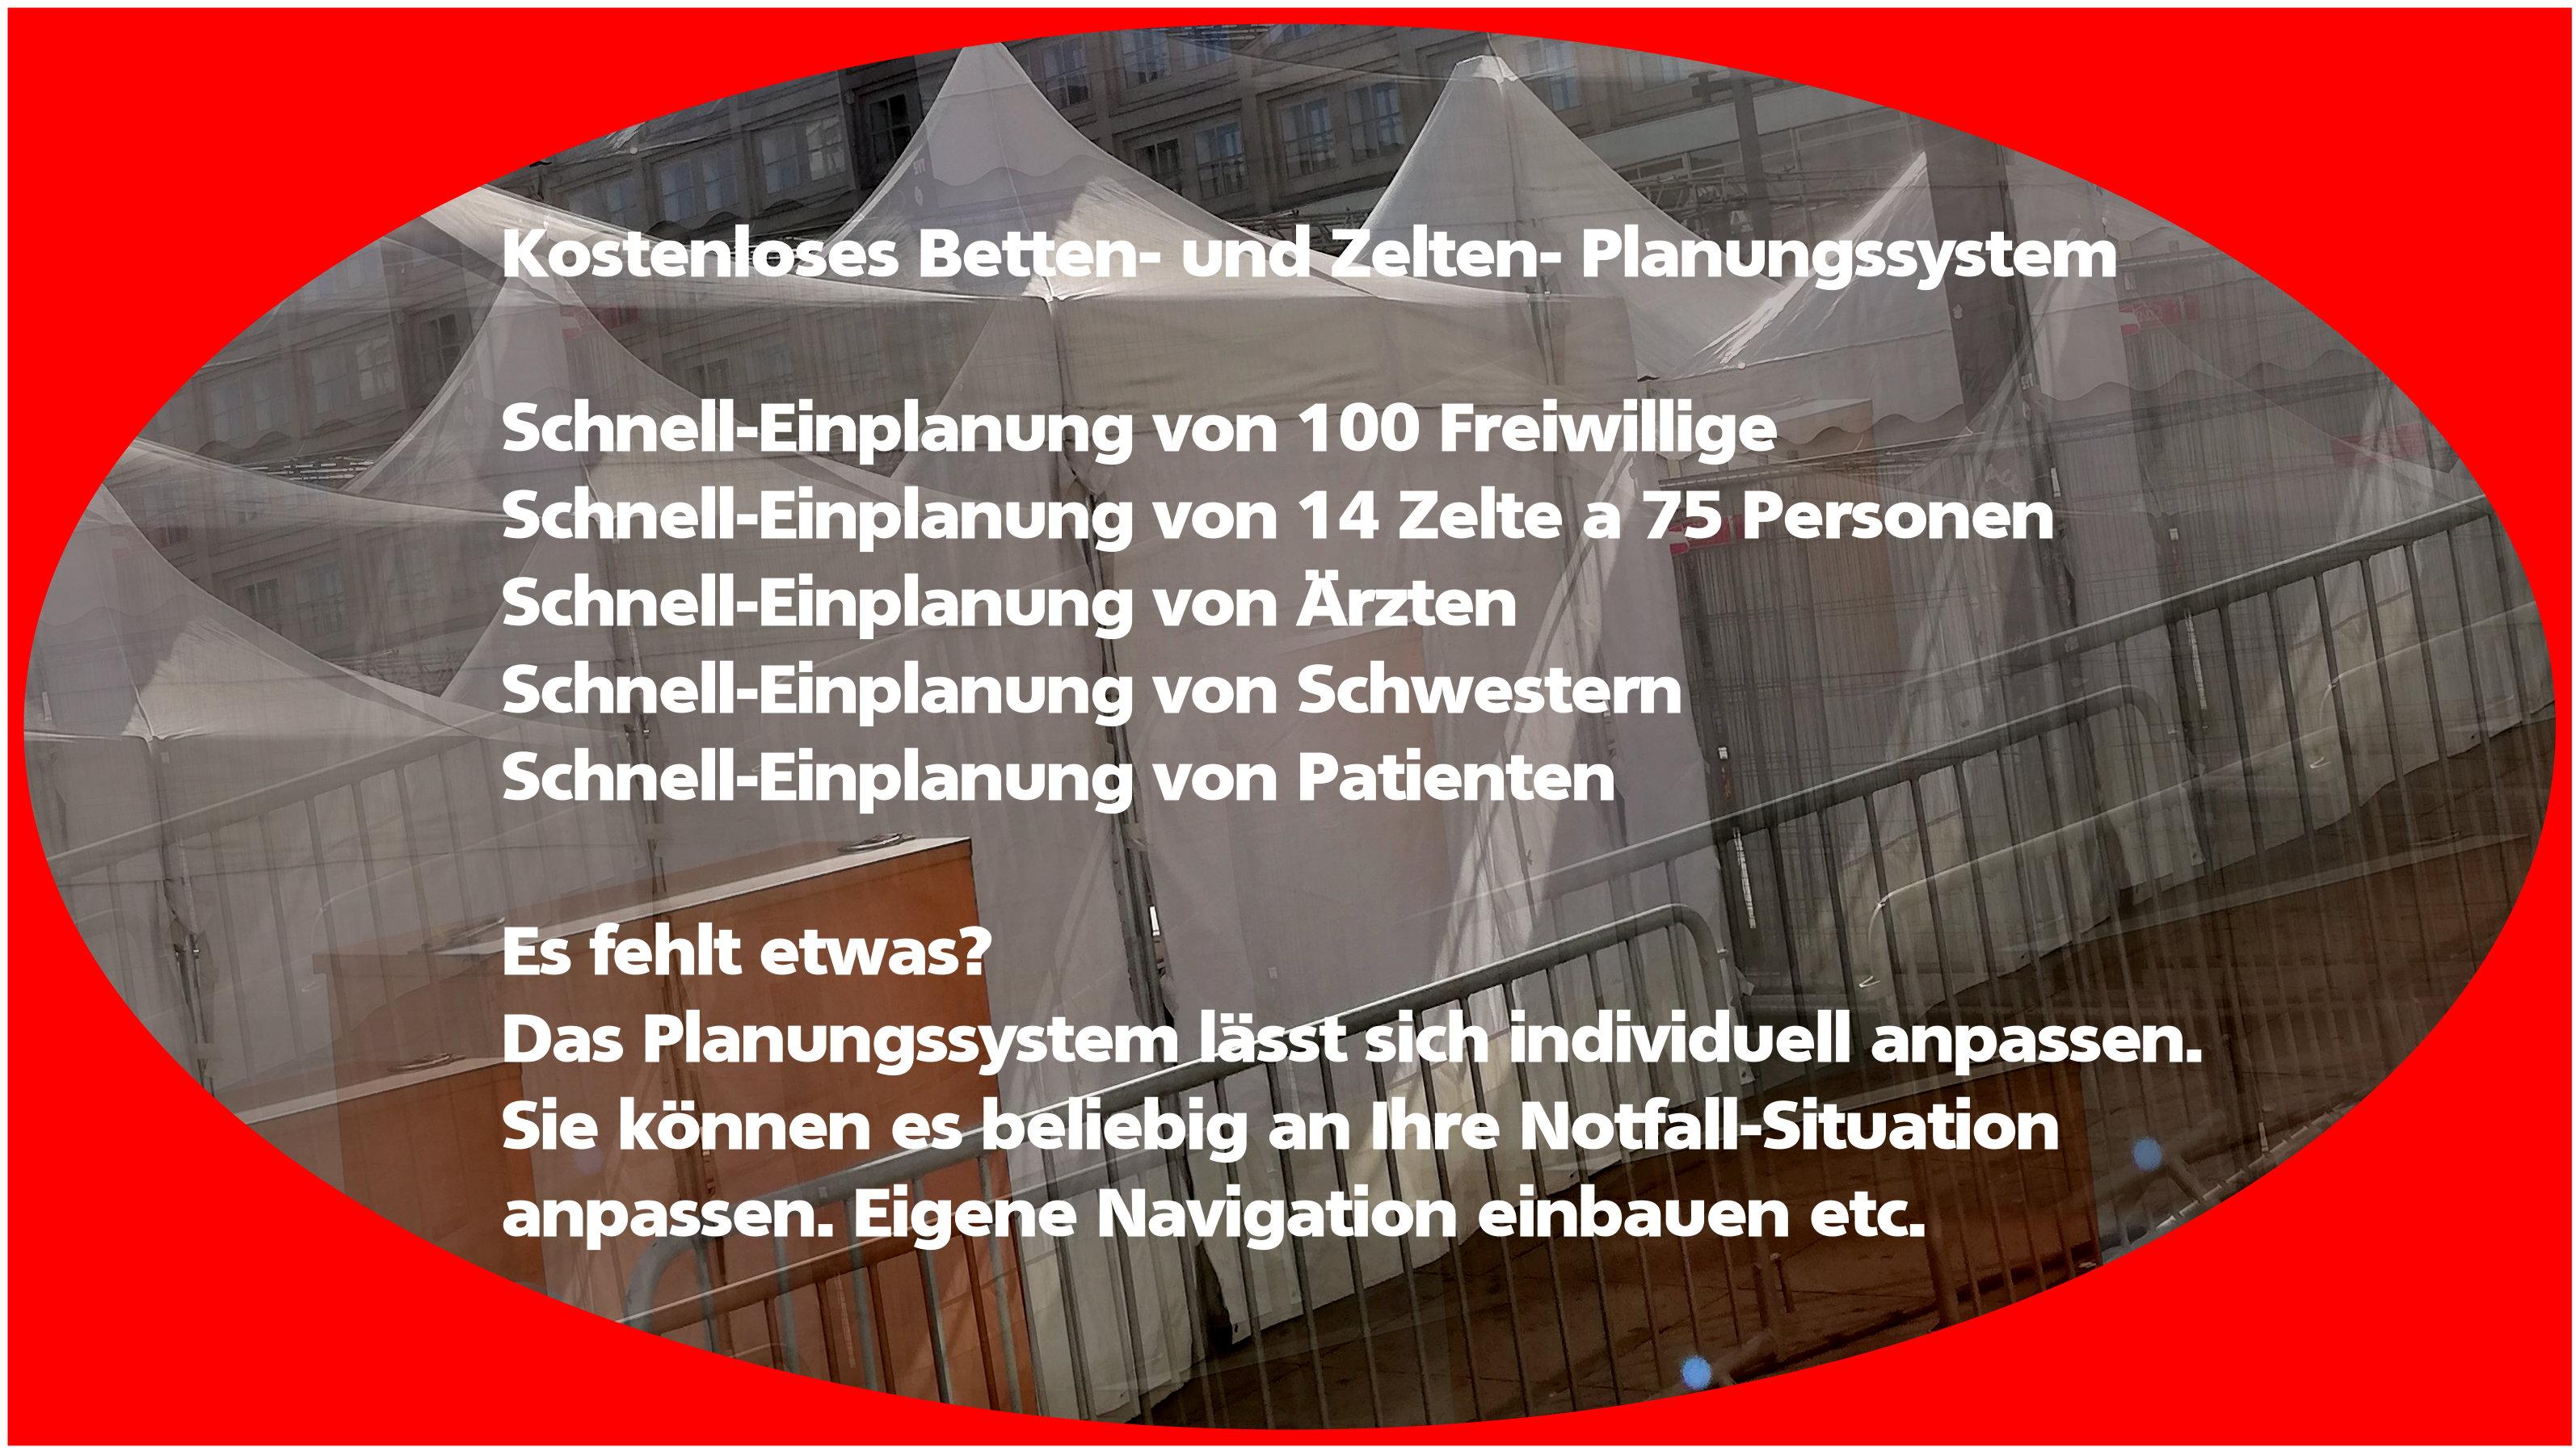 Zelt und Betten-Notfall-System